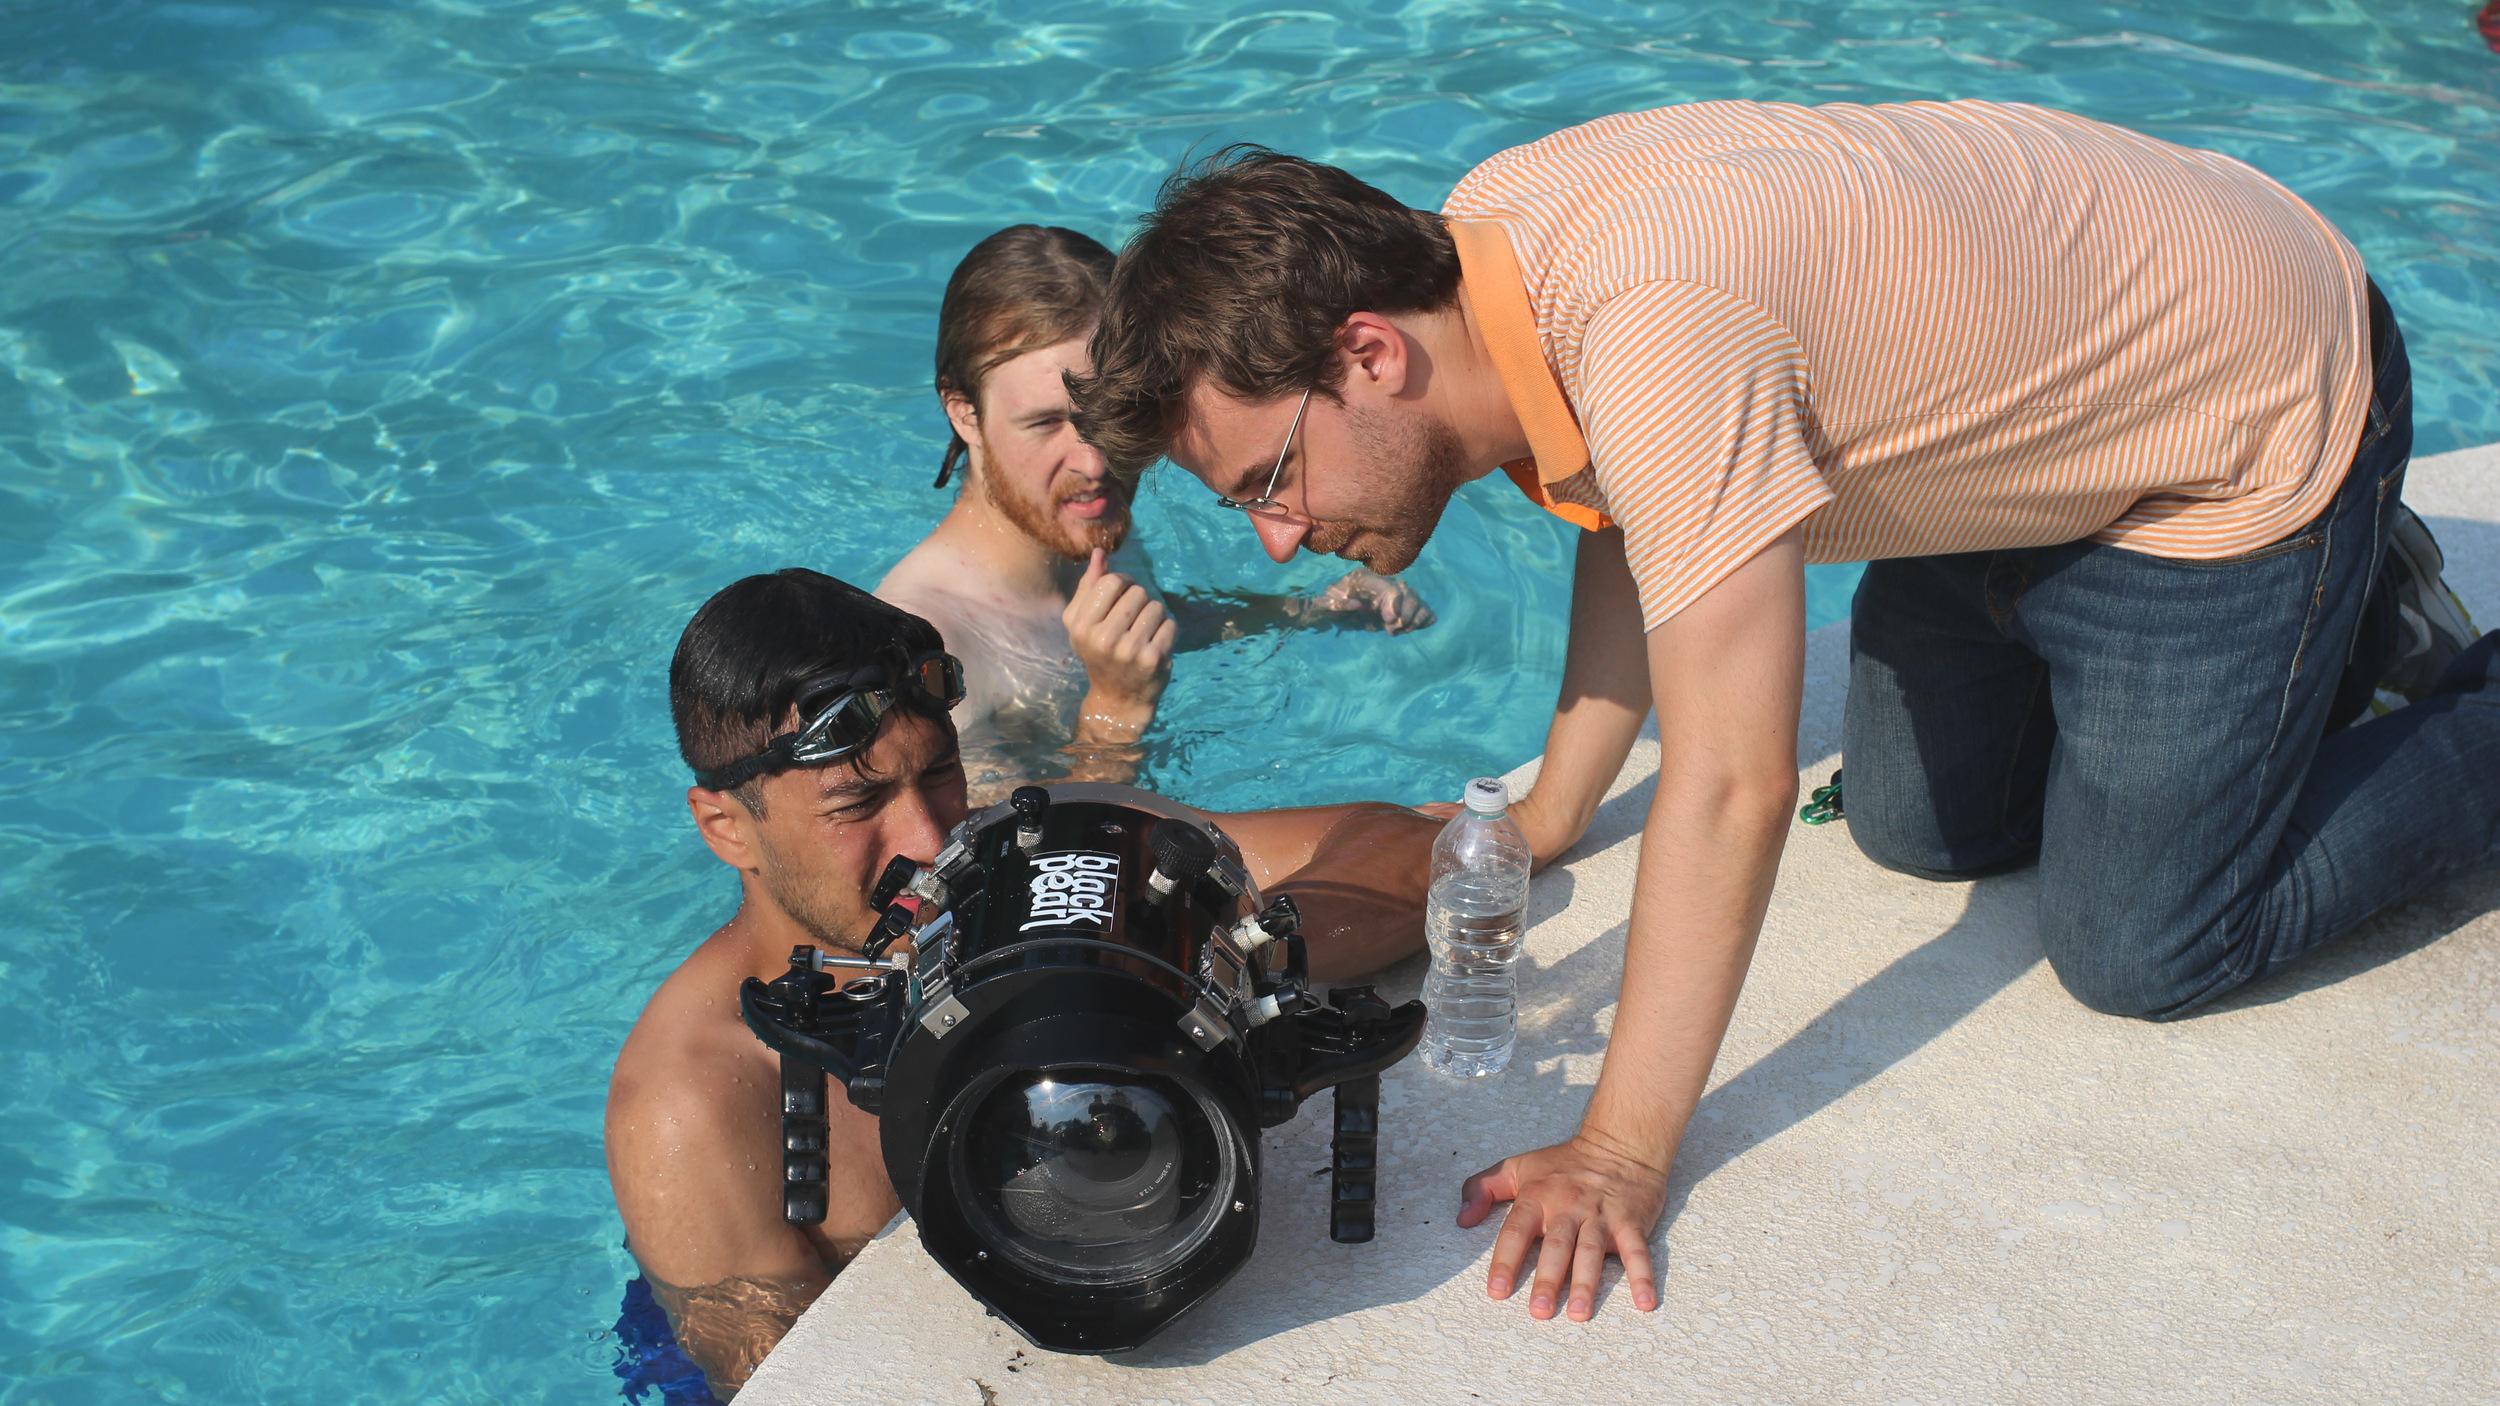 HG_BTS-checking-underwater.jpg